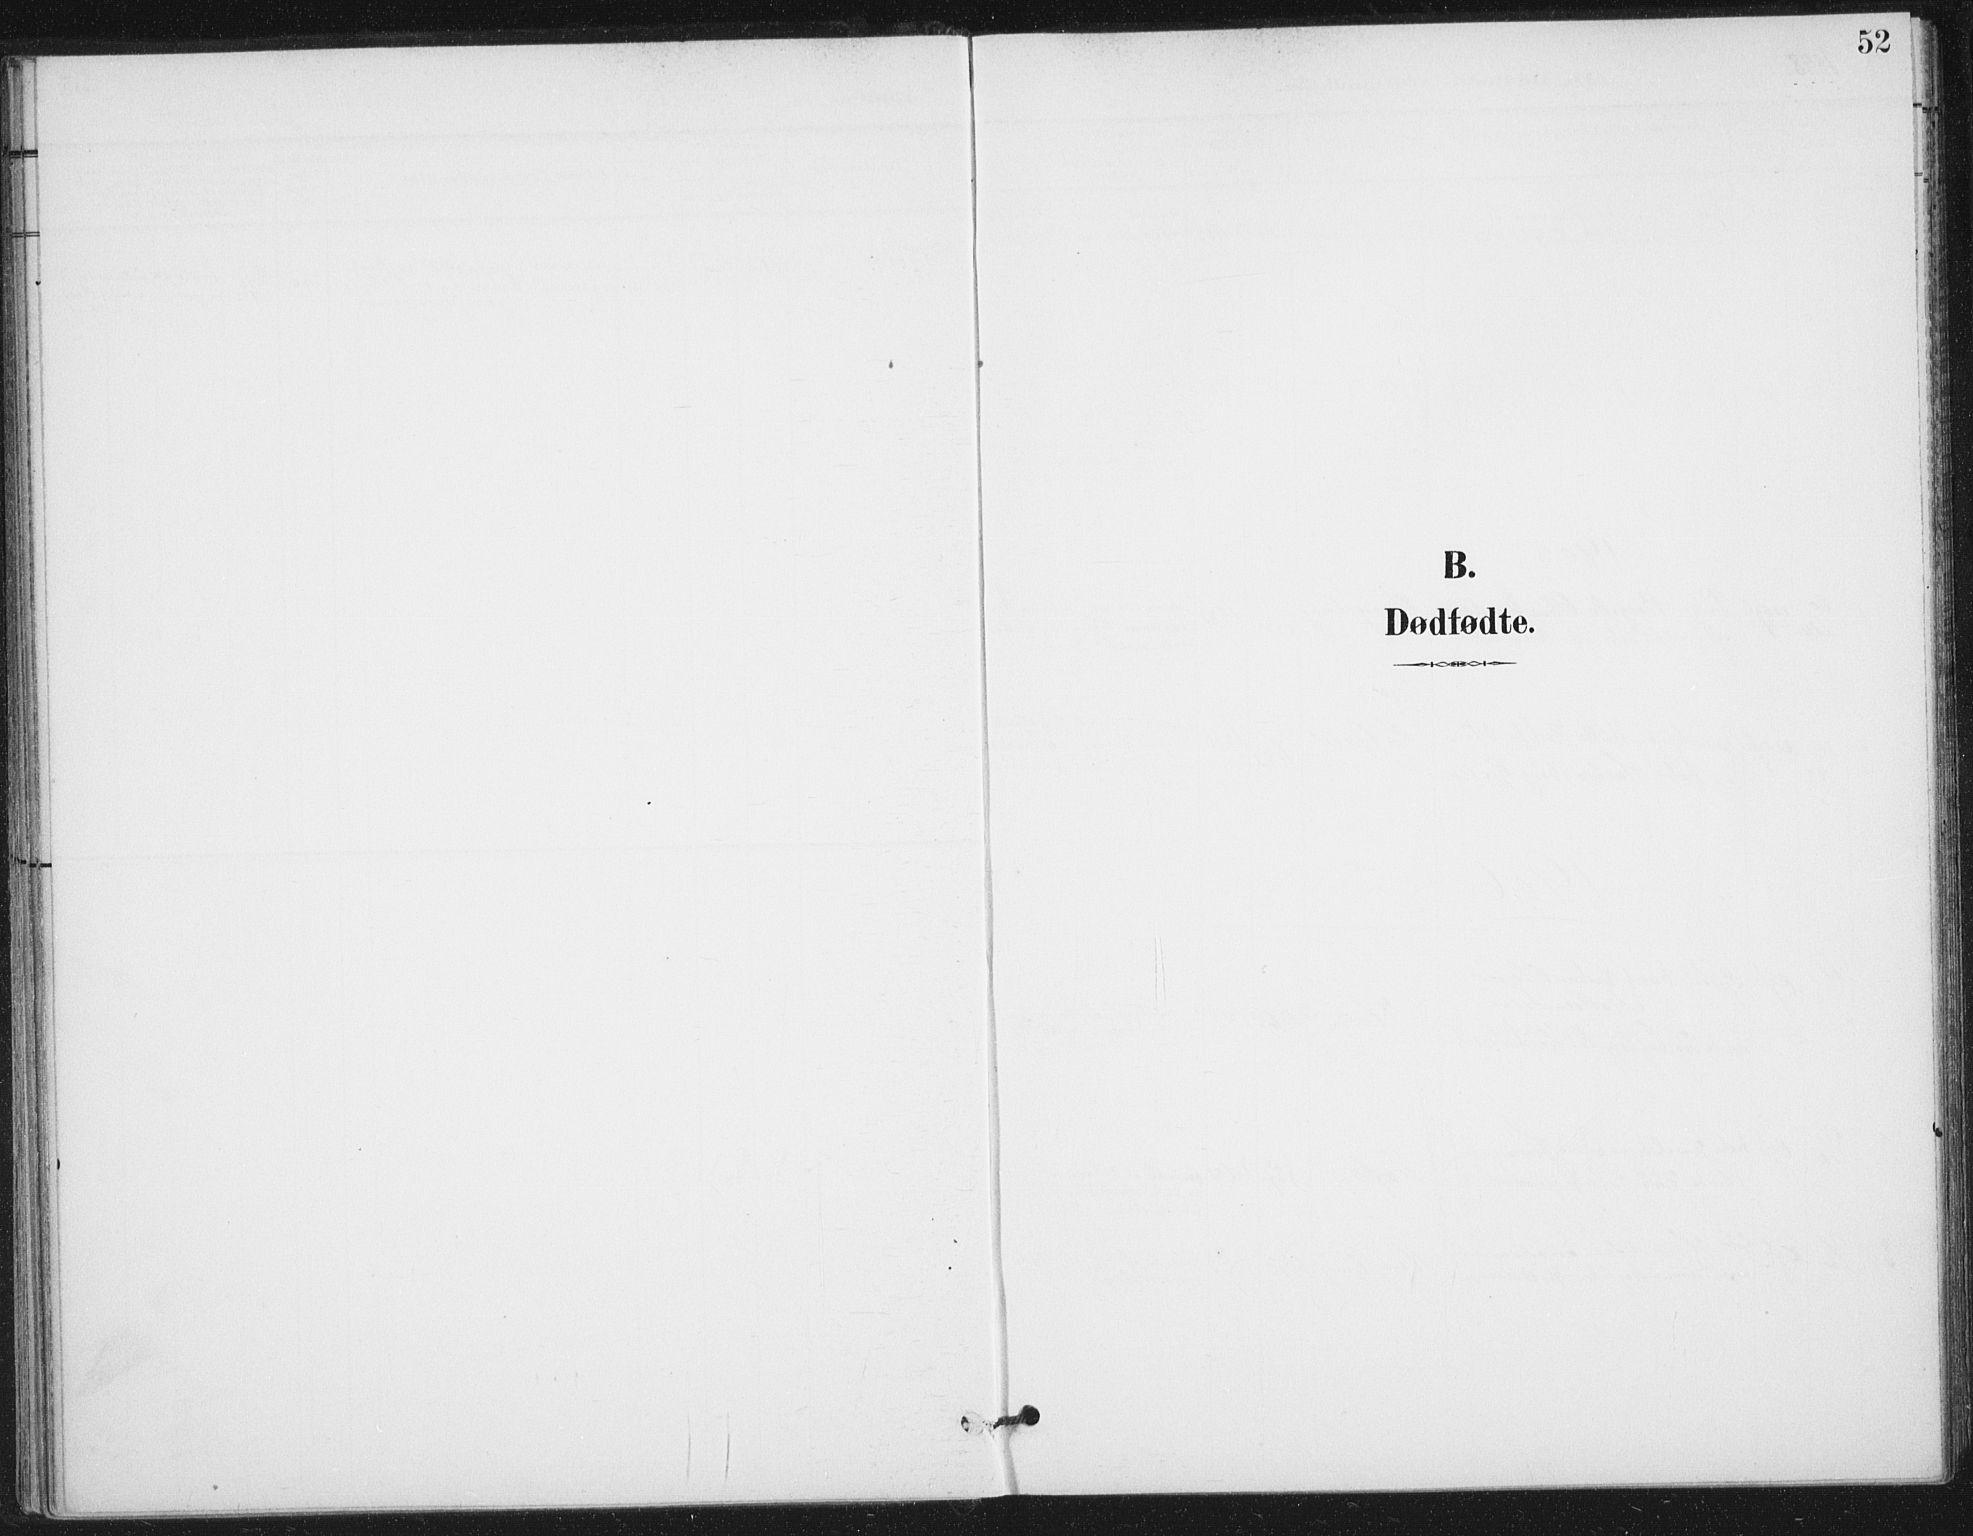 SAT, Ministerialprotokoller, klokkerbøker og fødselsregistre - Nordland, 894/L1356: Ministerialbok nr. 894A02, 1897-1914, s. 52